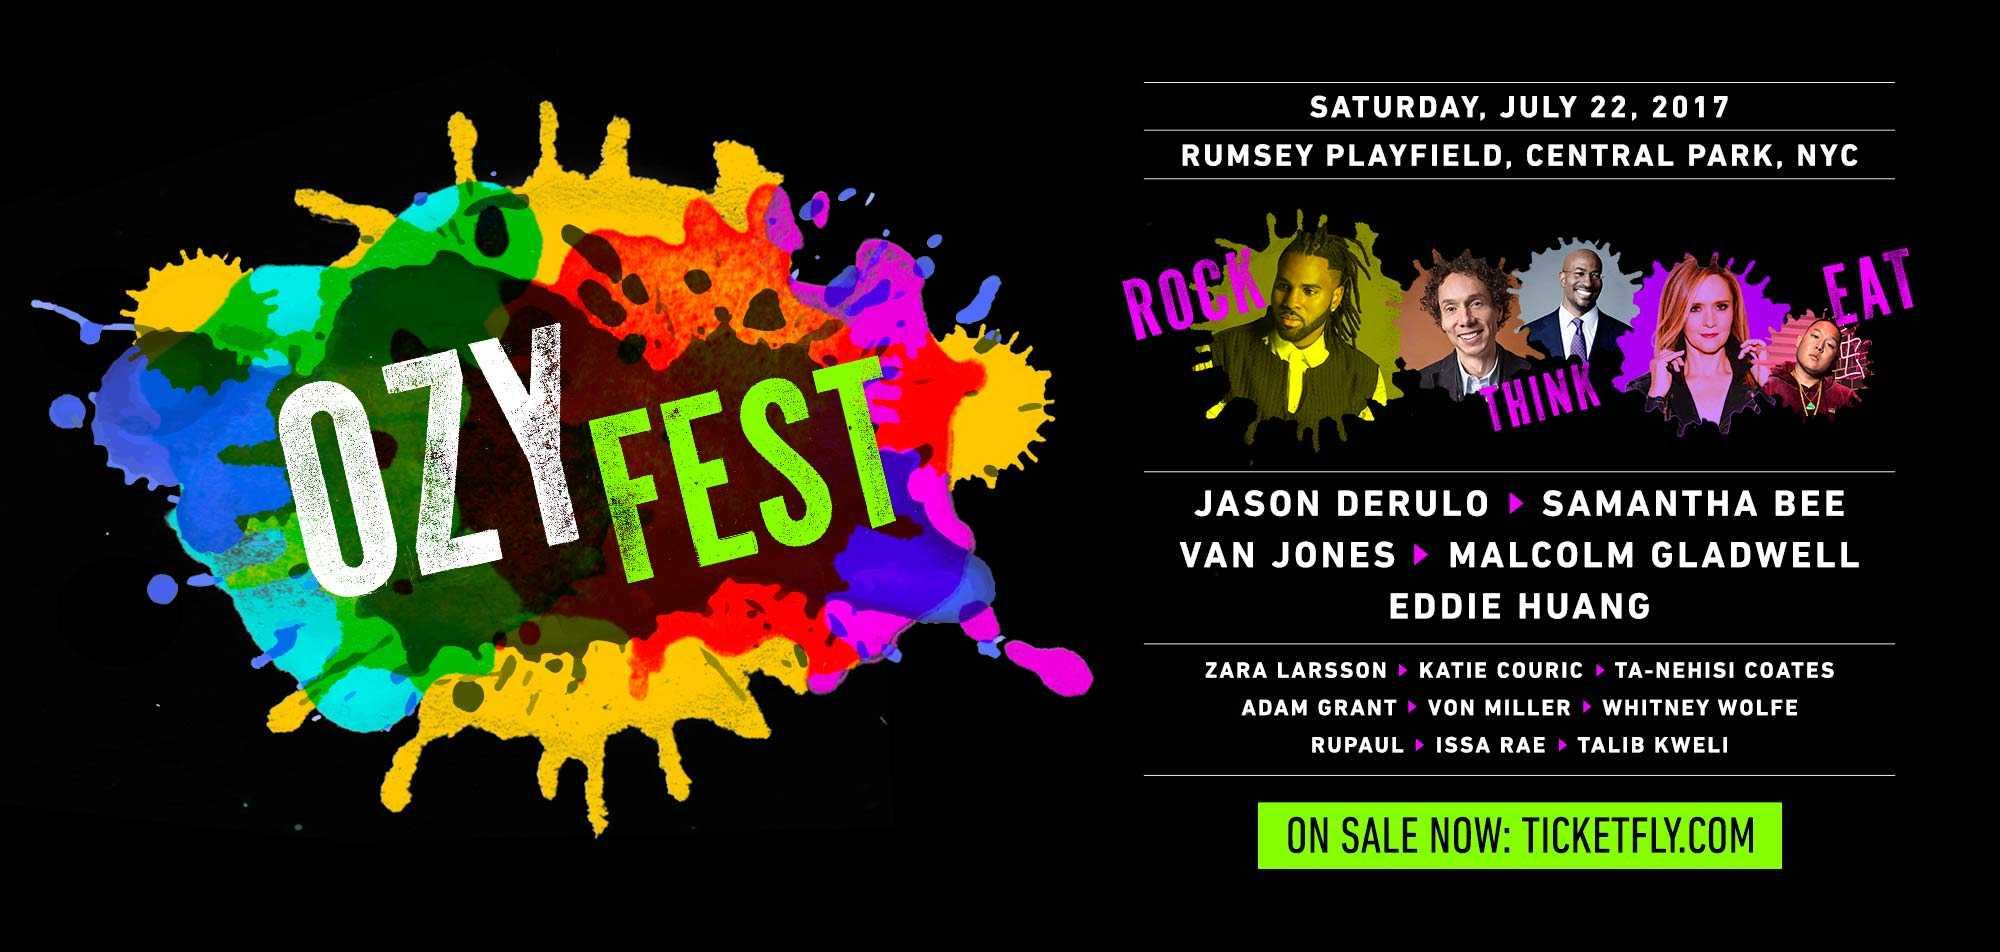 OZY Fest Ft. Jason Derulo, Talib Kweli, Van Jones, Ru Paul, and Von Miller on 7/22